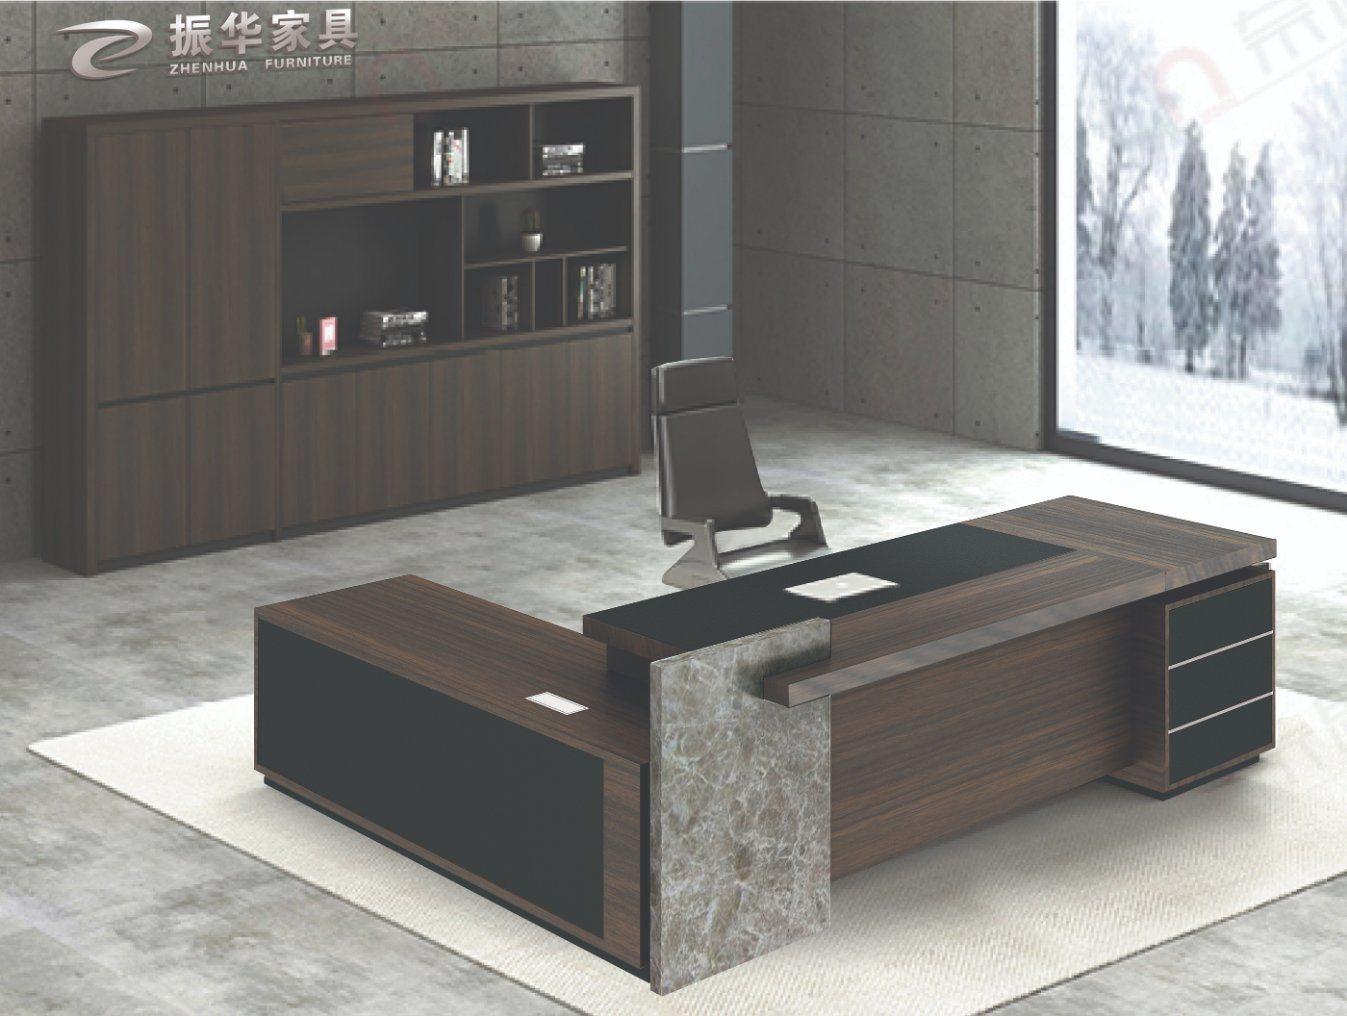 Image of: China Office Furniture Executive Office Desk Set American Style Office Furniture Desk Organizer Set Executive Desk Set With Cabinet China Office Table Office Furniture